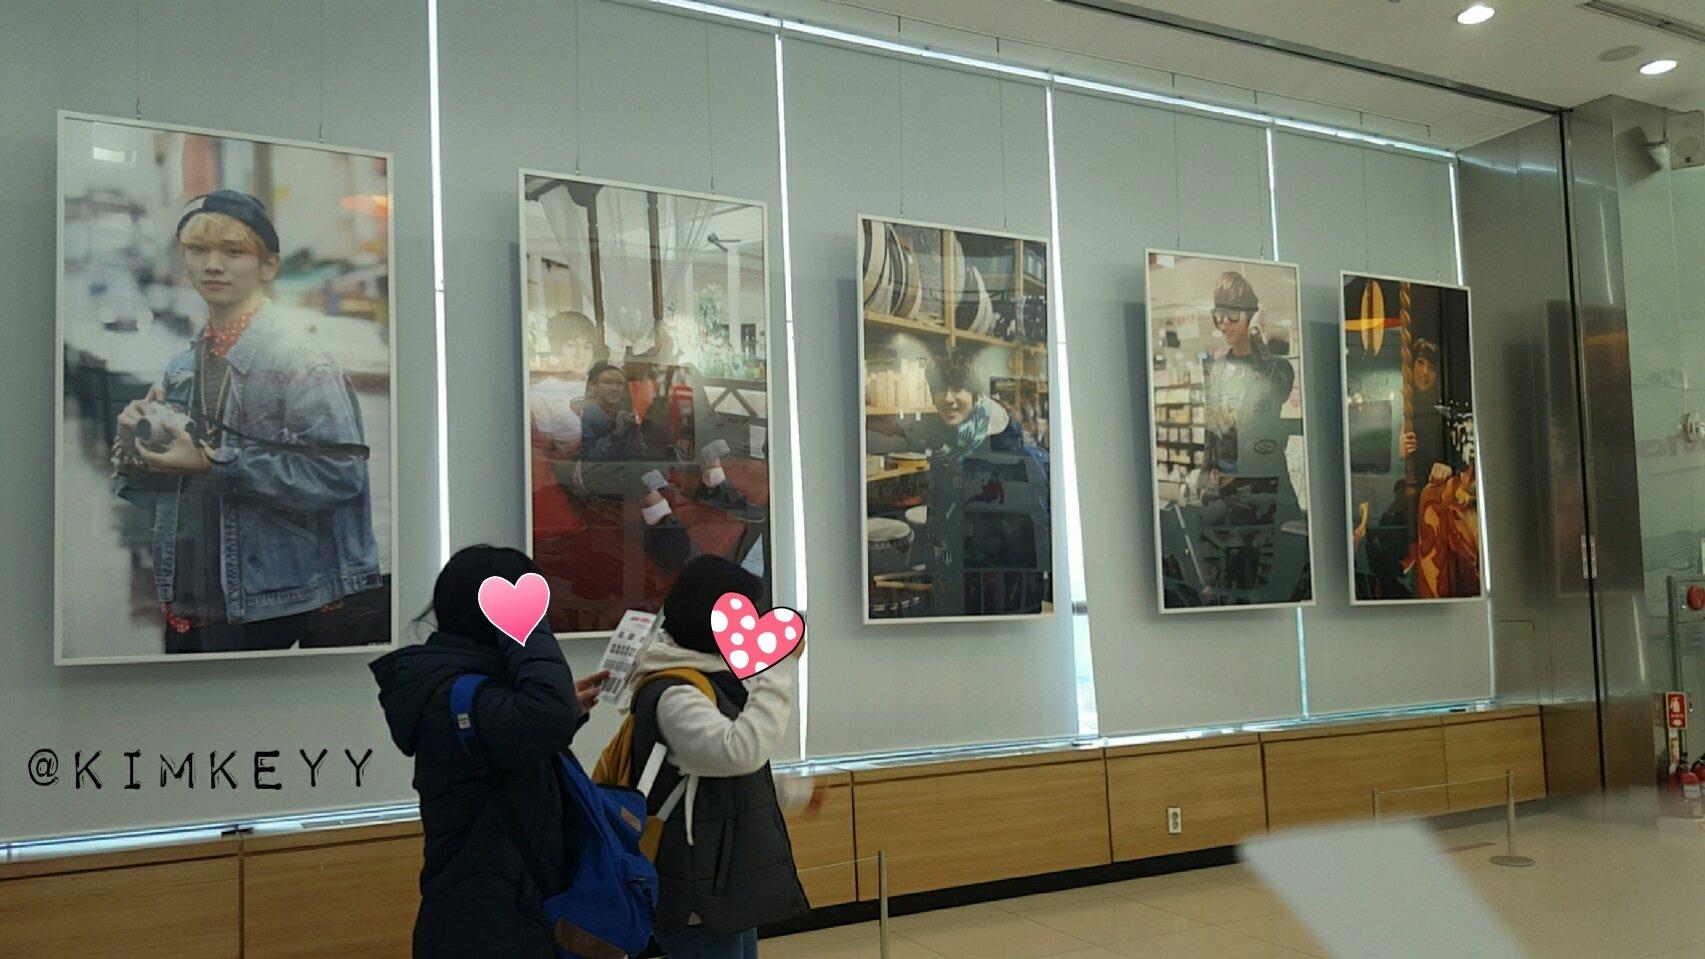 SHINee @ SHINee Surprise Vacation Exhibition 24943219079_baa7c0c58e_o